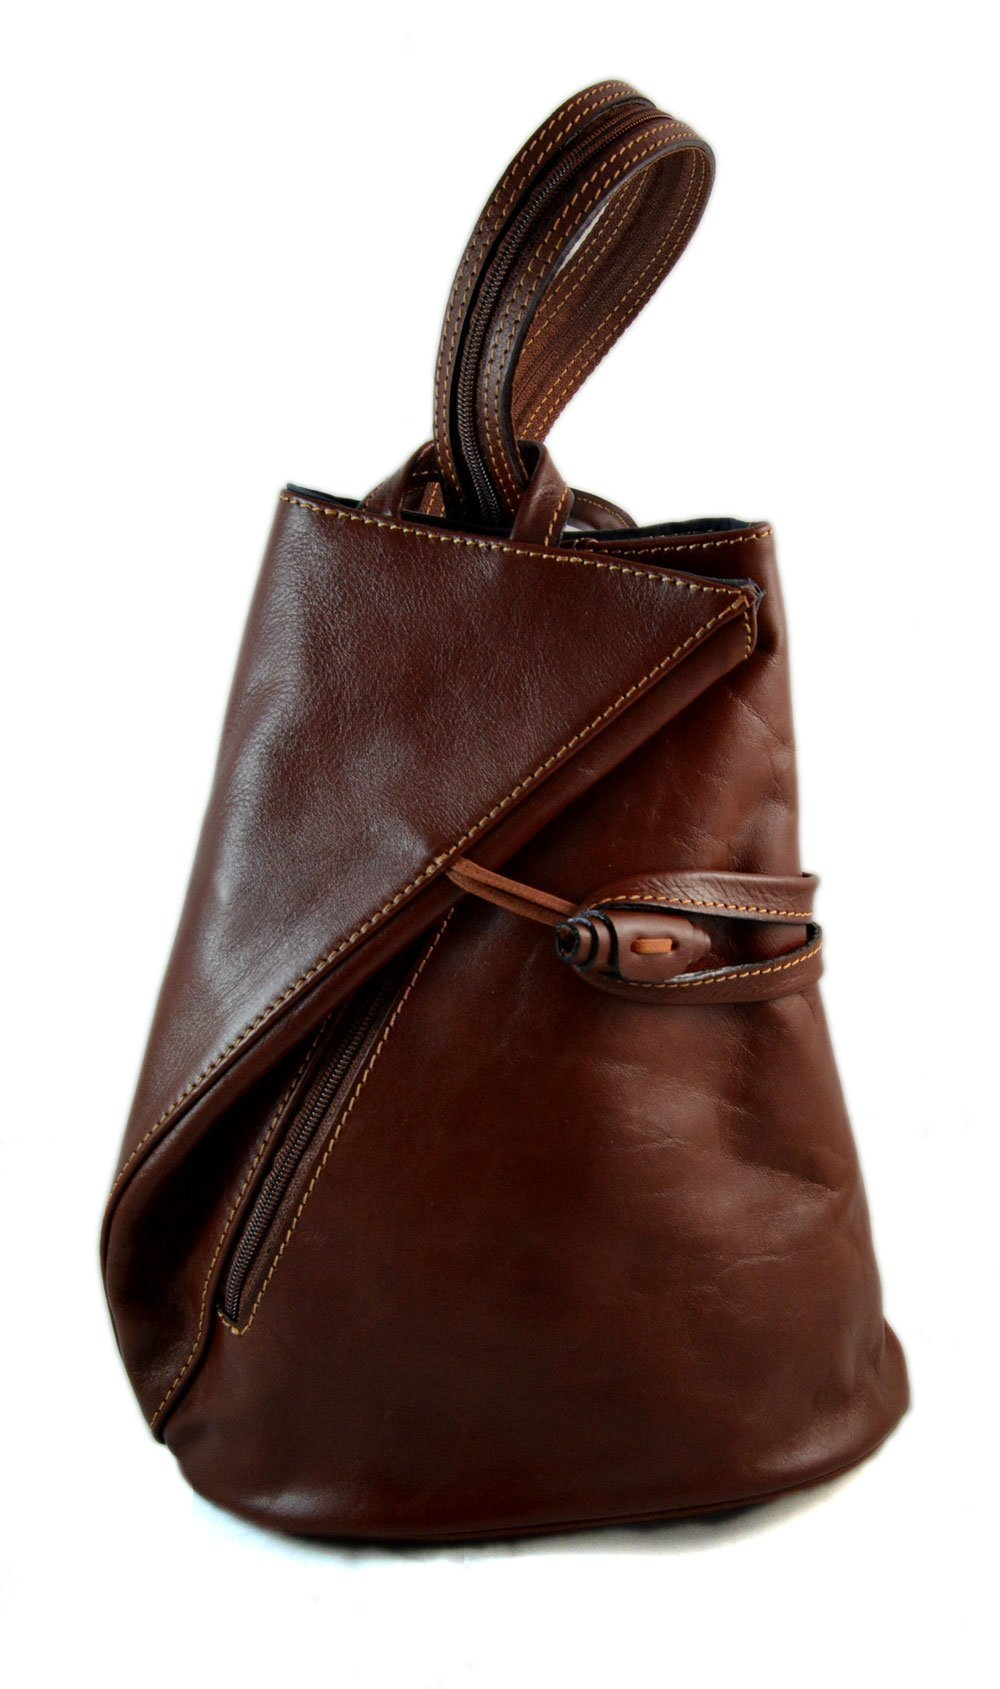 Luxury leather backpack travel bag weekender sports bag gym bag leather shoulder ladies mens bag satchel original made in Italy brown